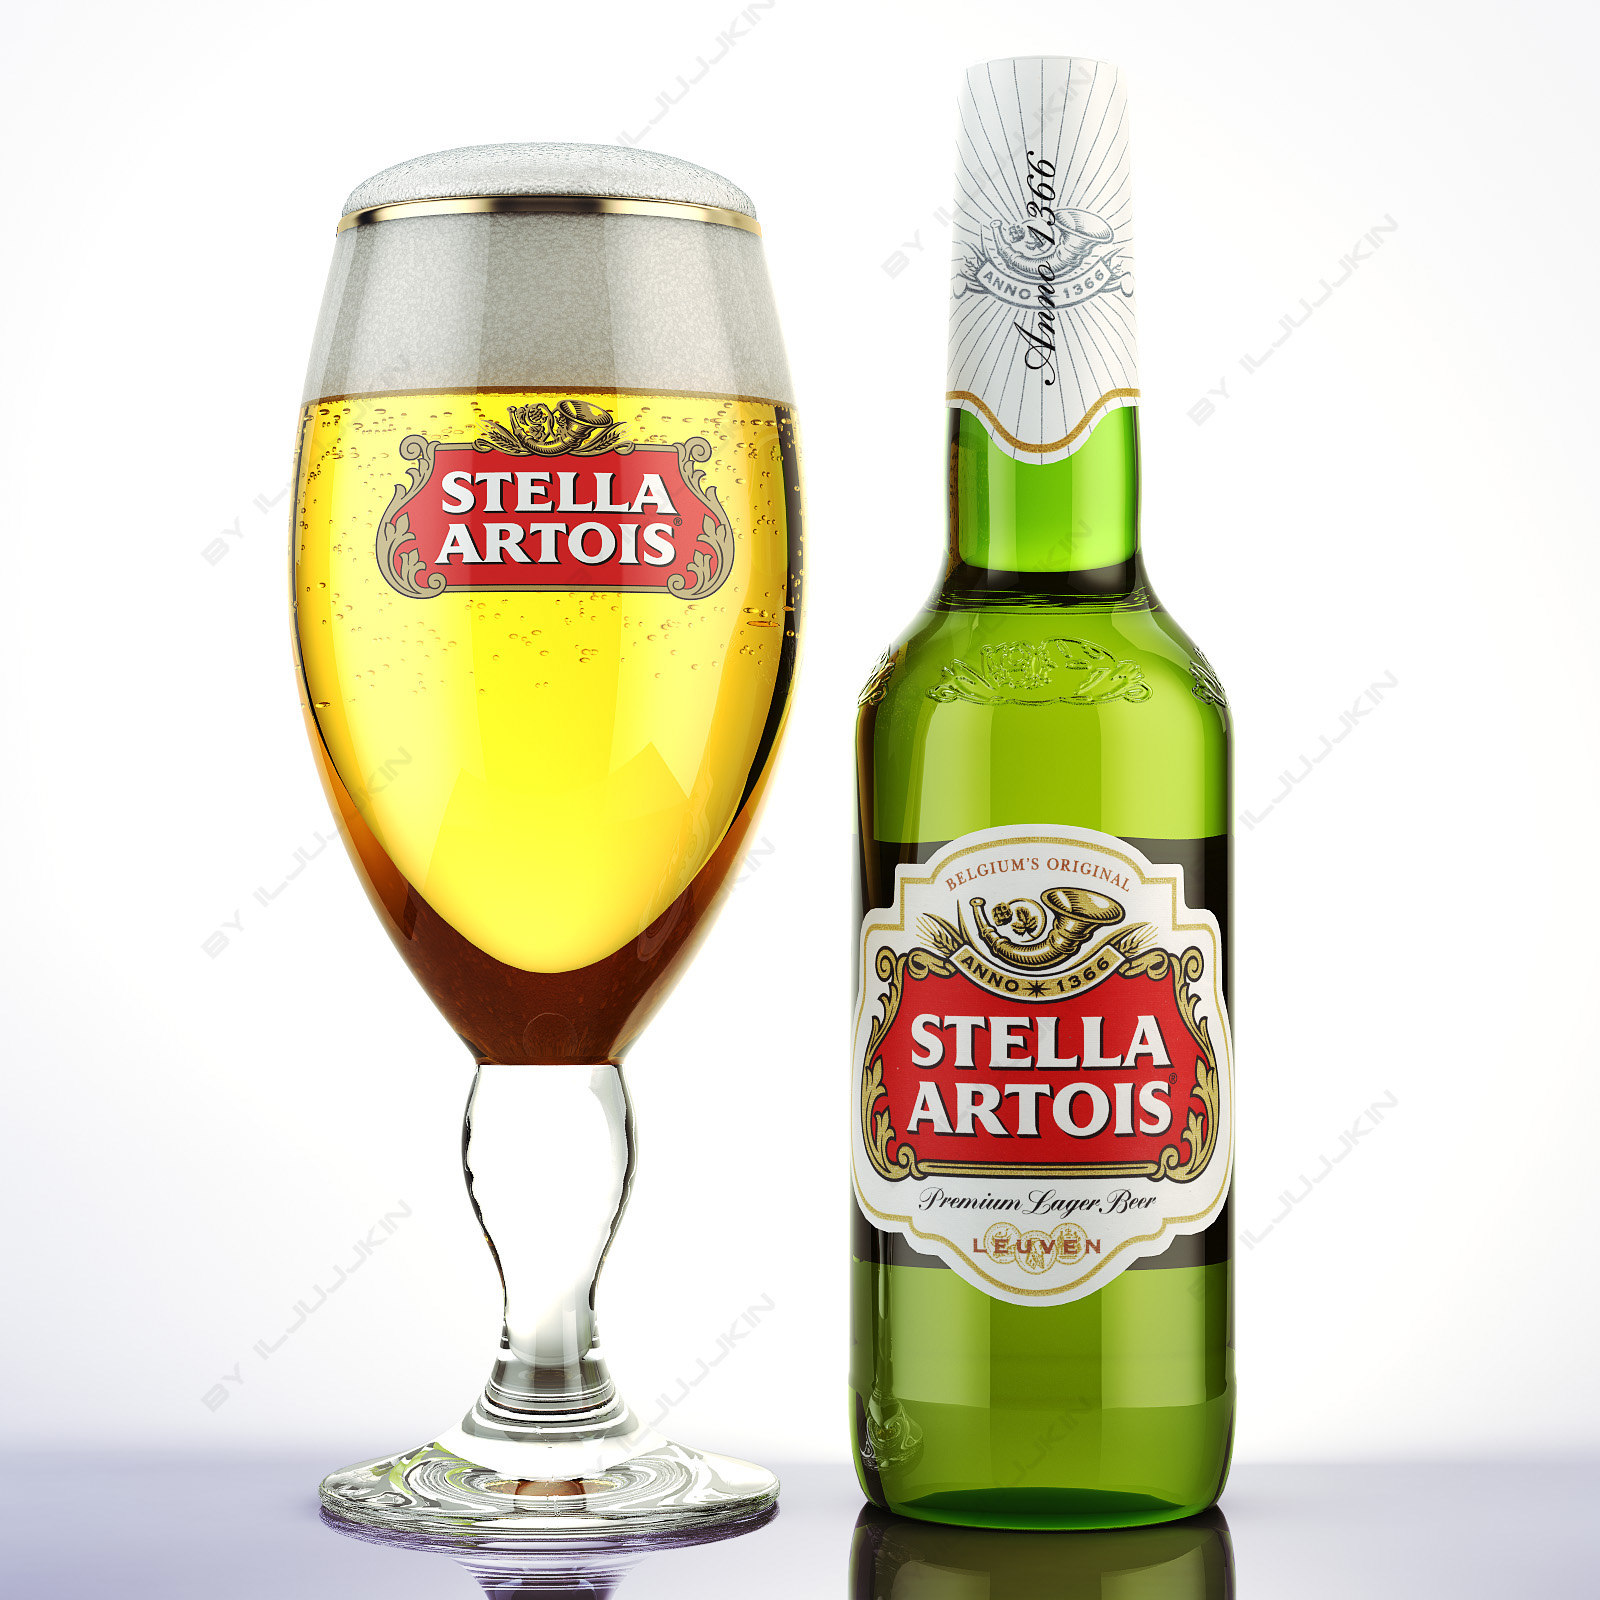 Bottle_Stella_03.jpg